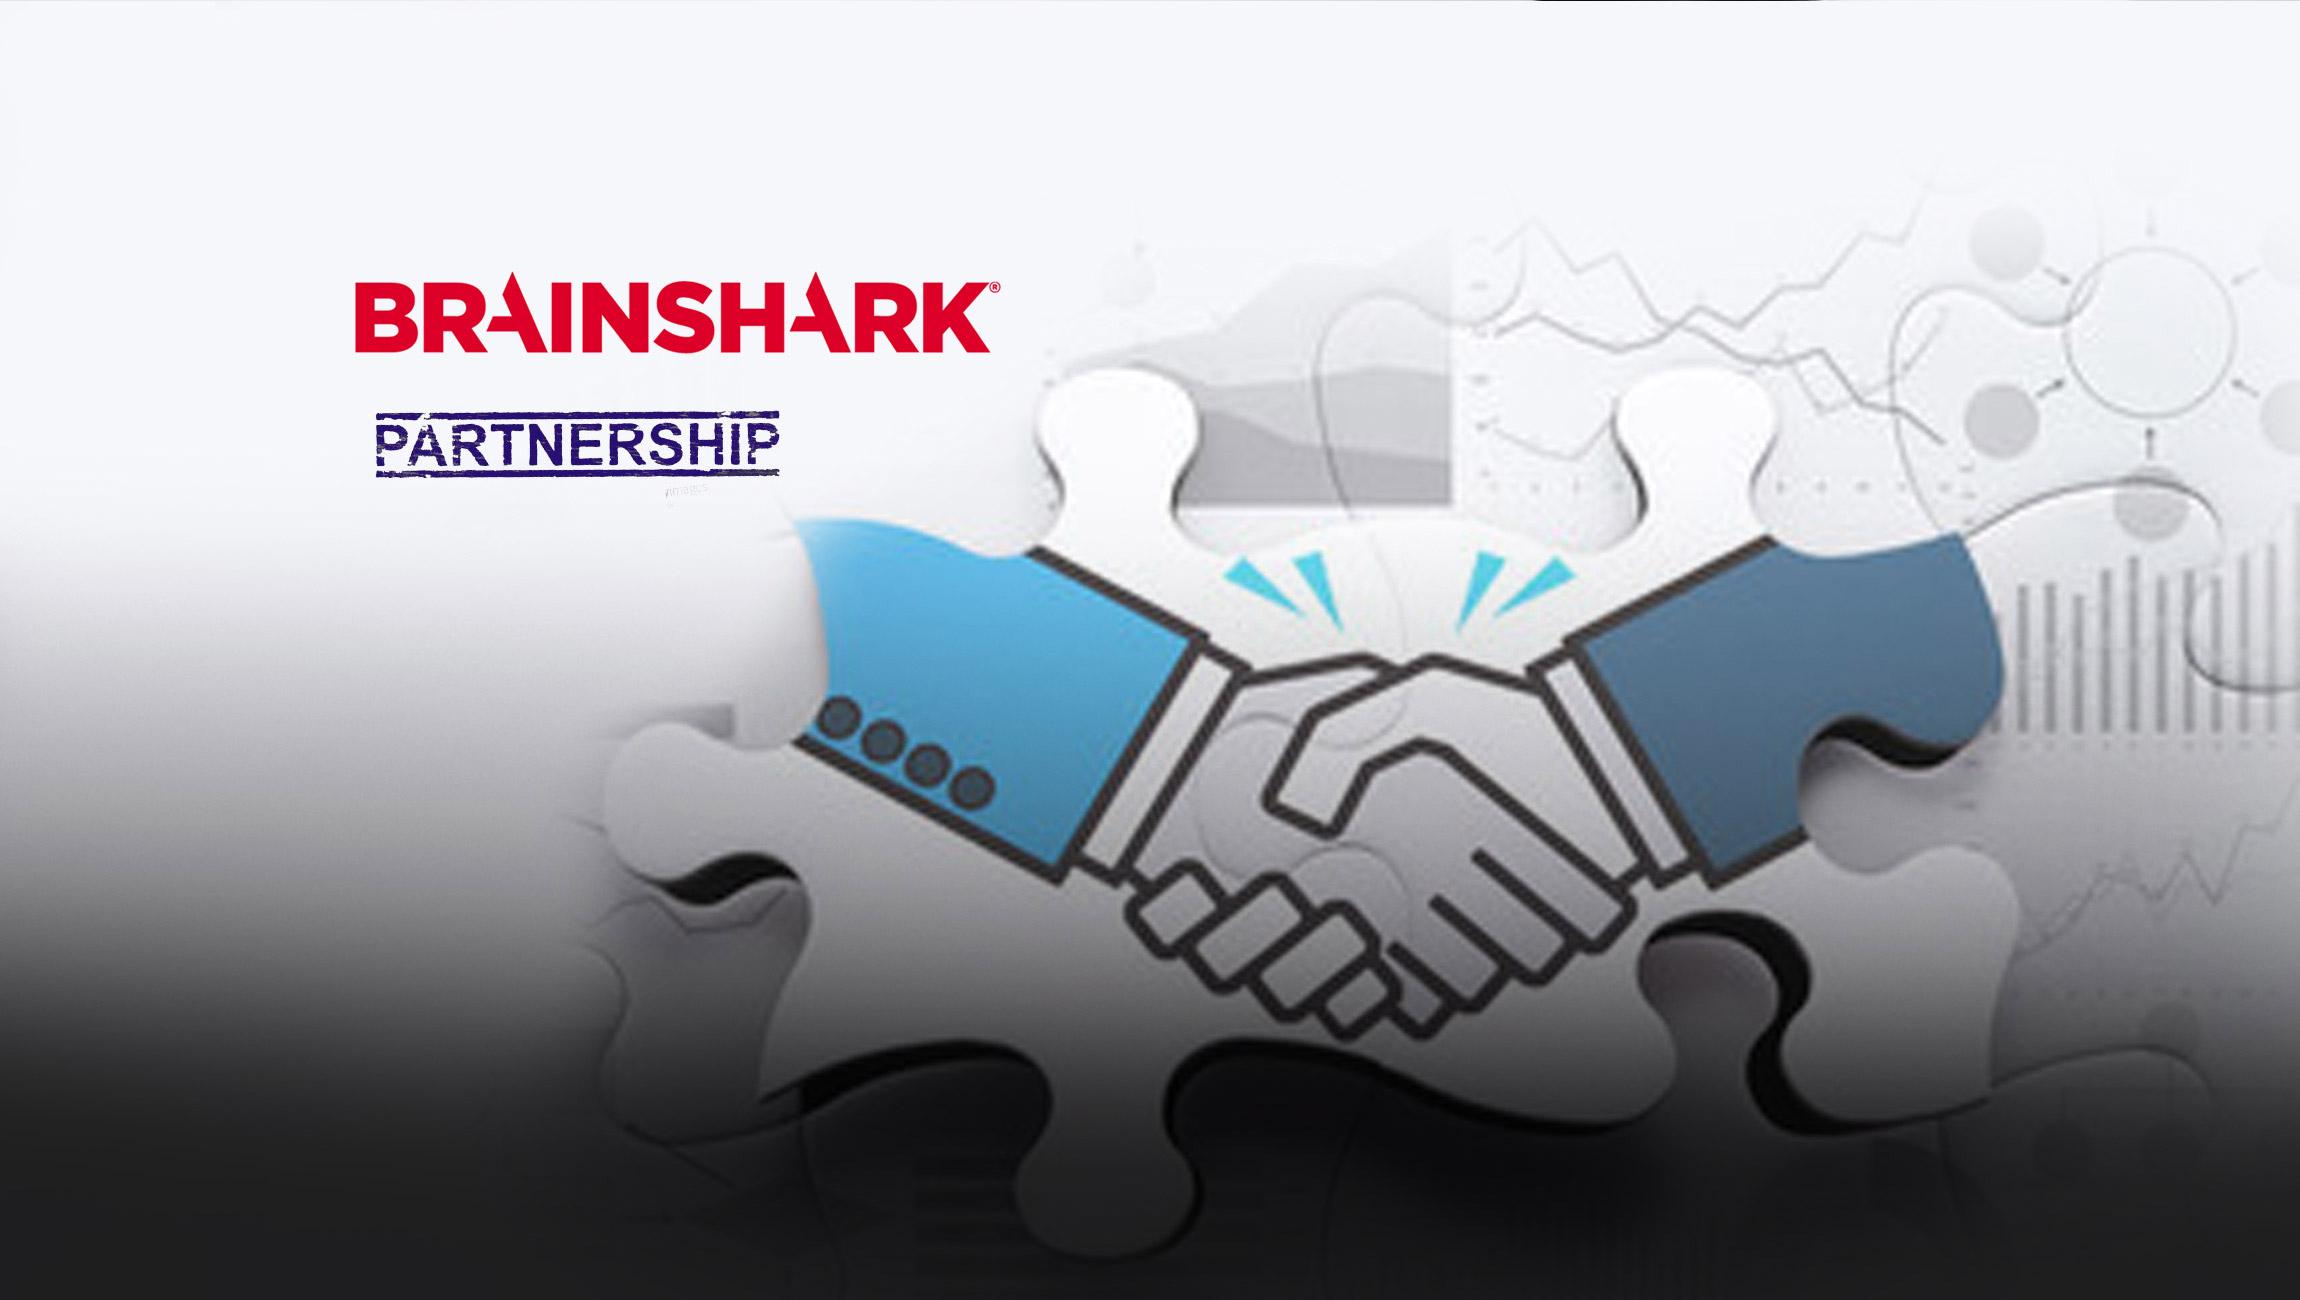 Brainshark Announces New Partnerships to Enhance Sales Training